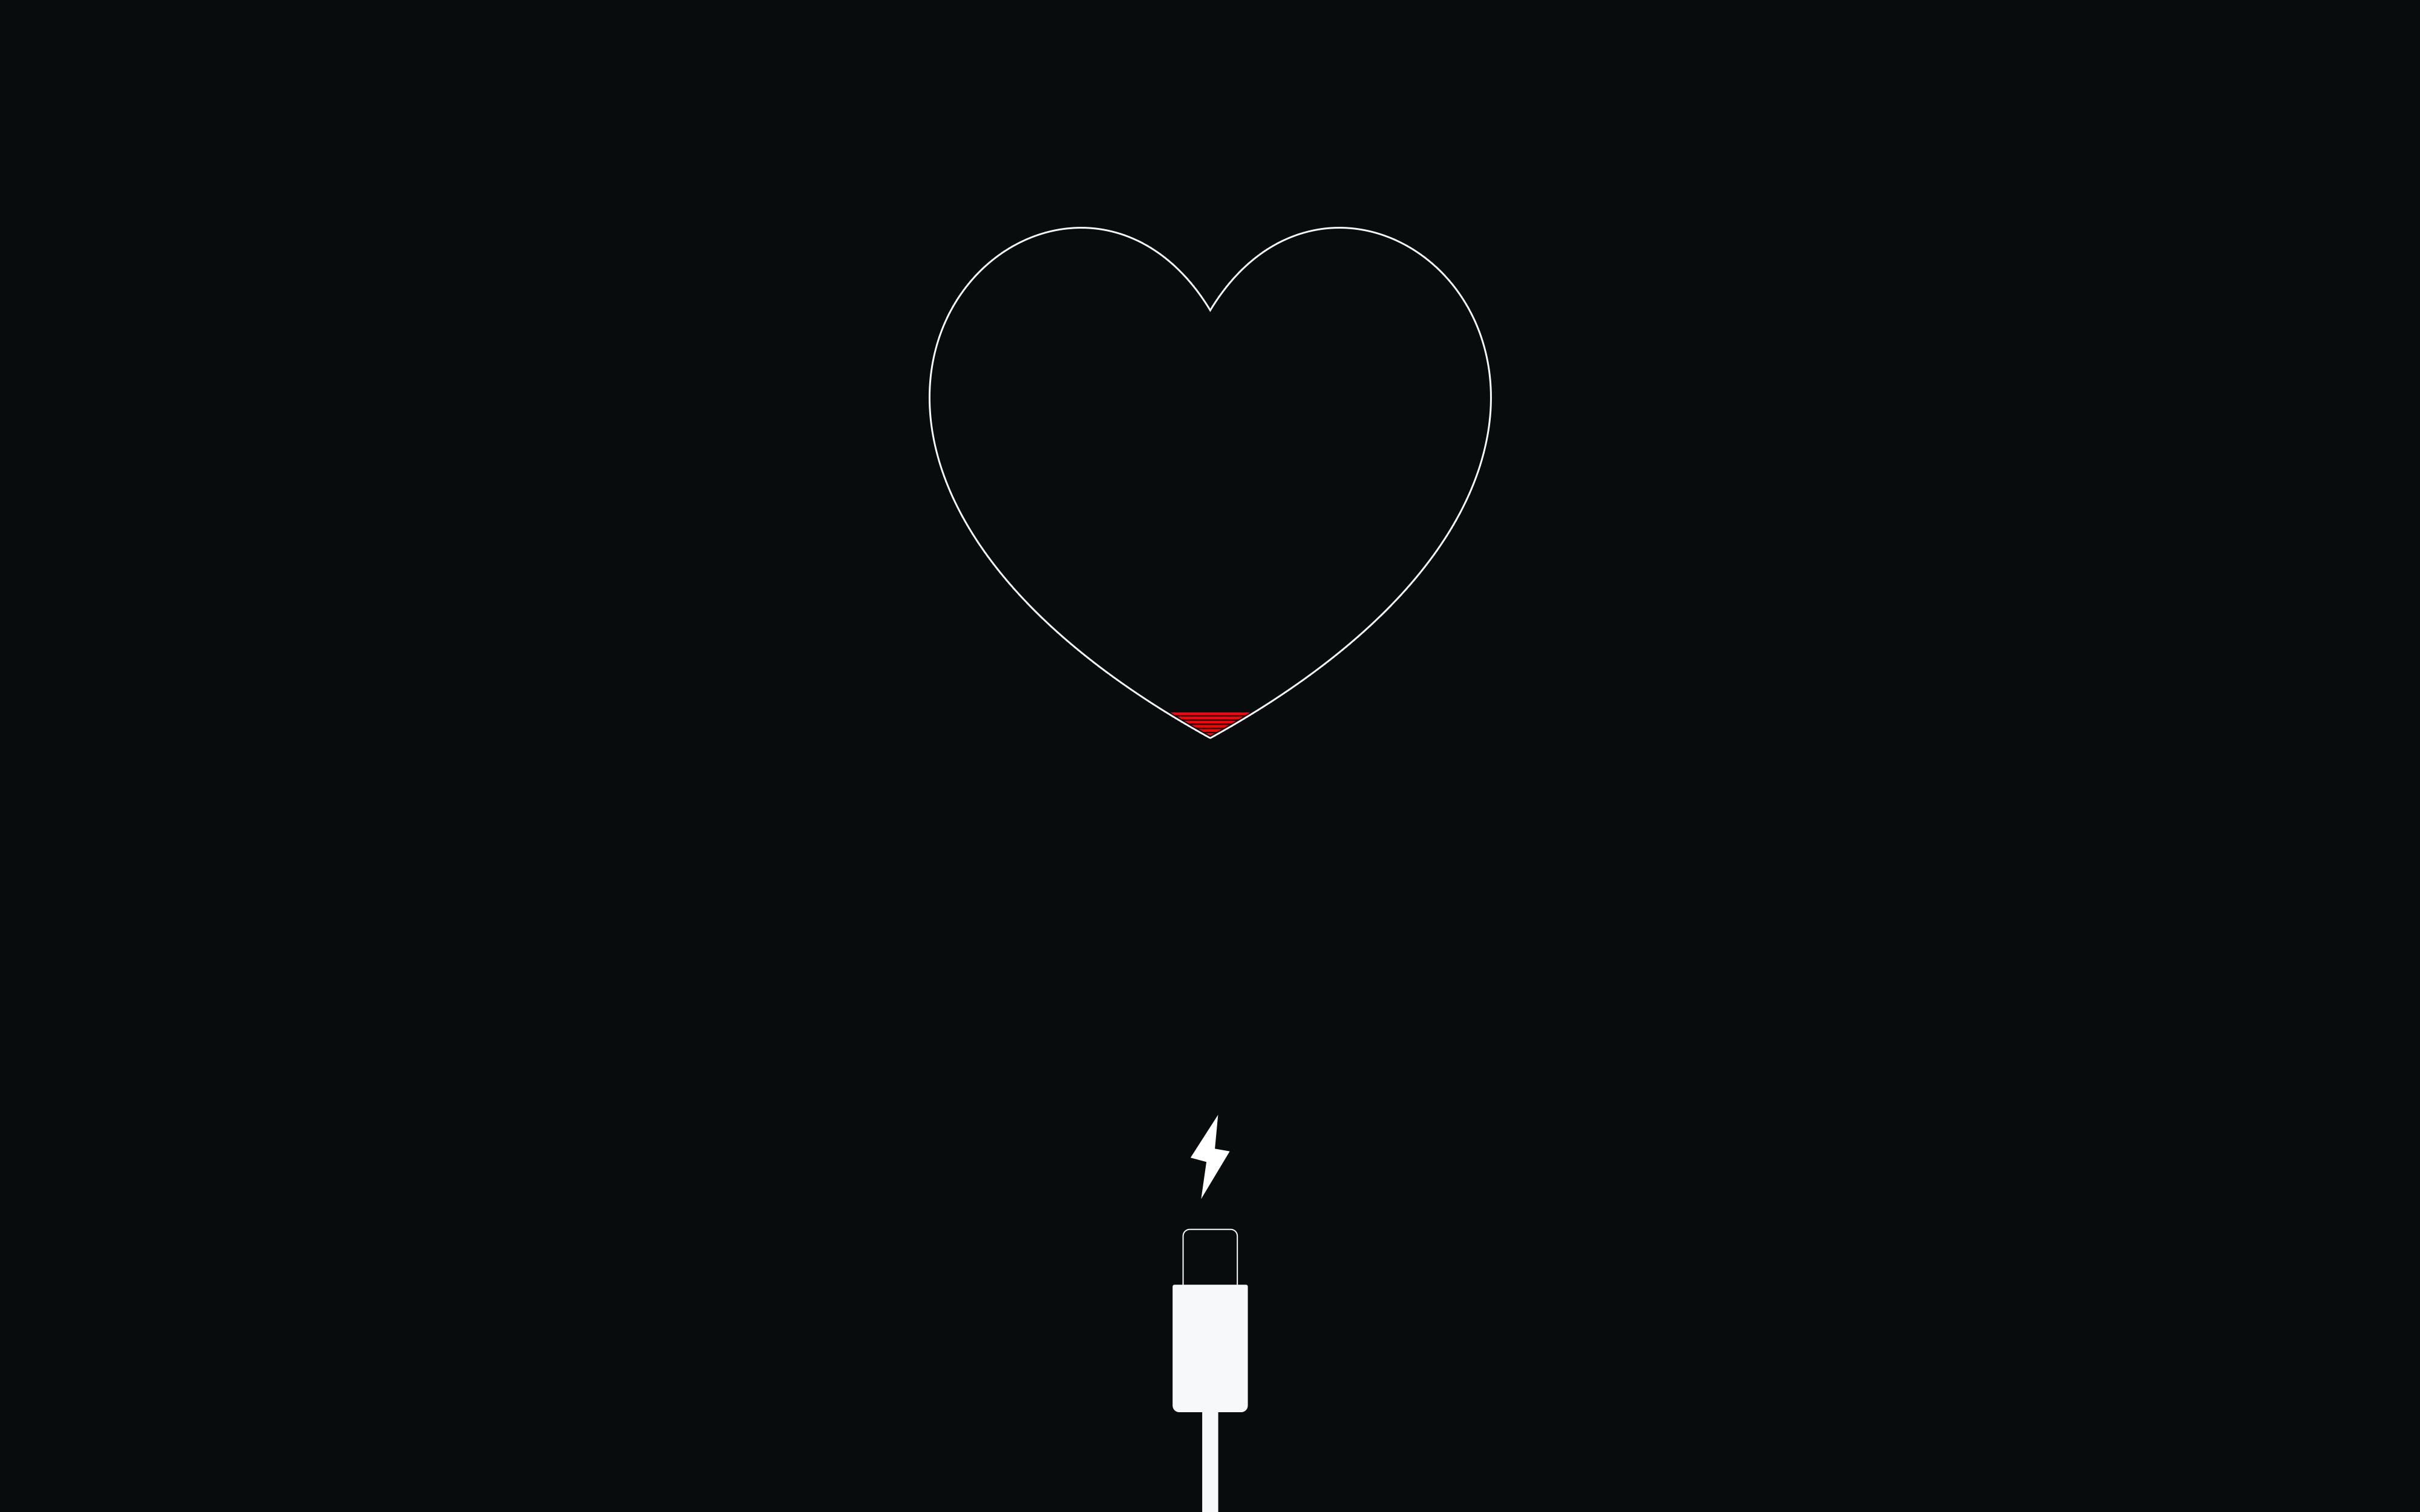 Wallpaper Minimalism Love Heart Lightning Circle Iphone